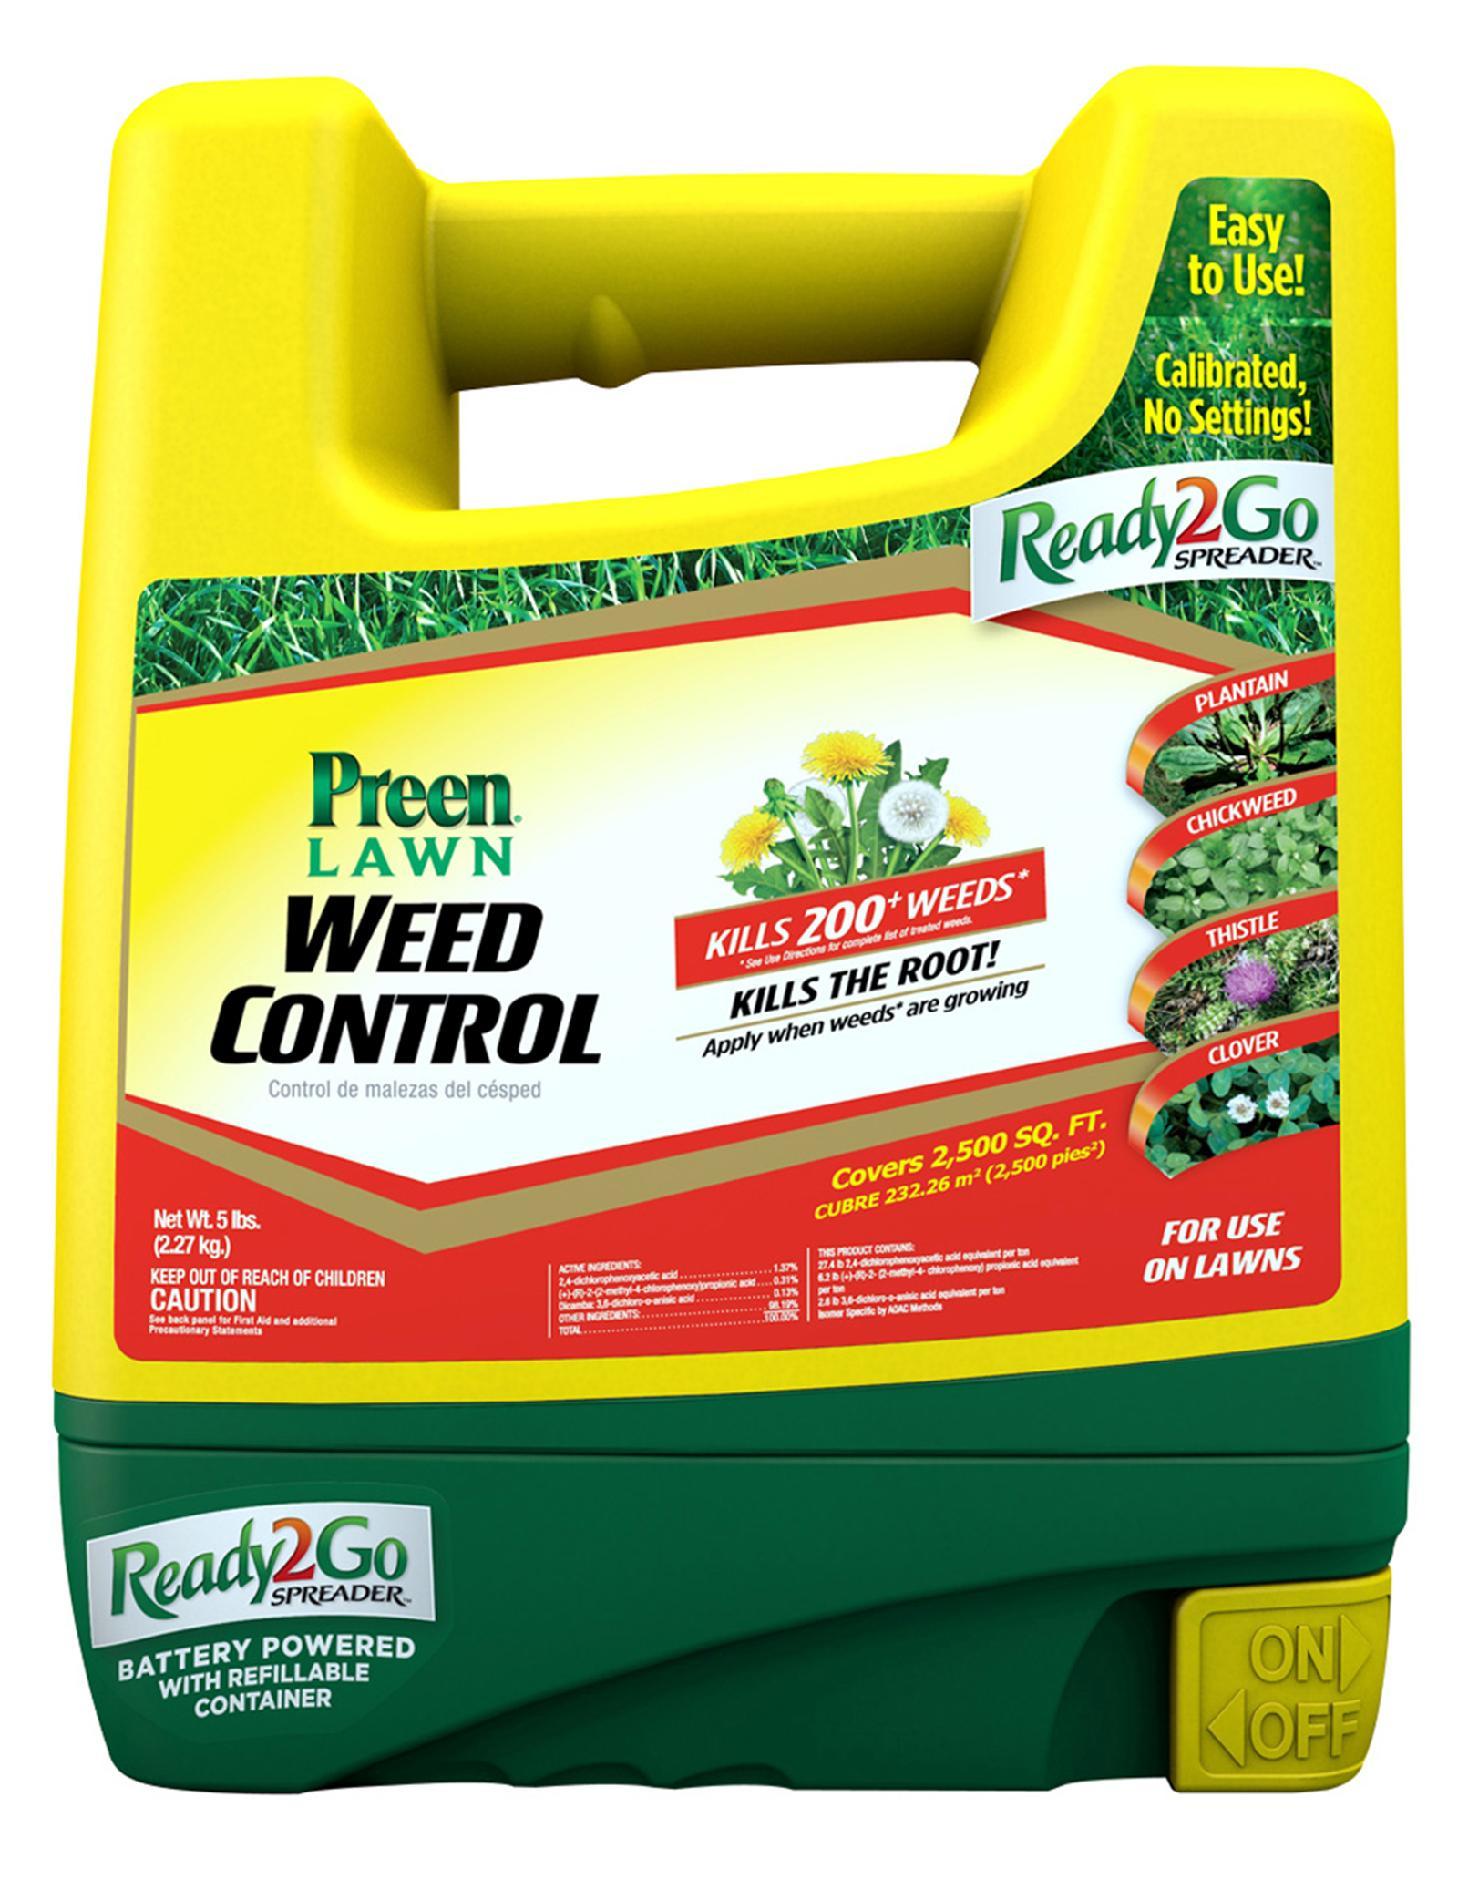 Preen 5 lb. Lawn Weed Control Ready2Go Spreader